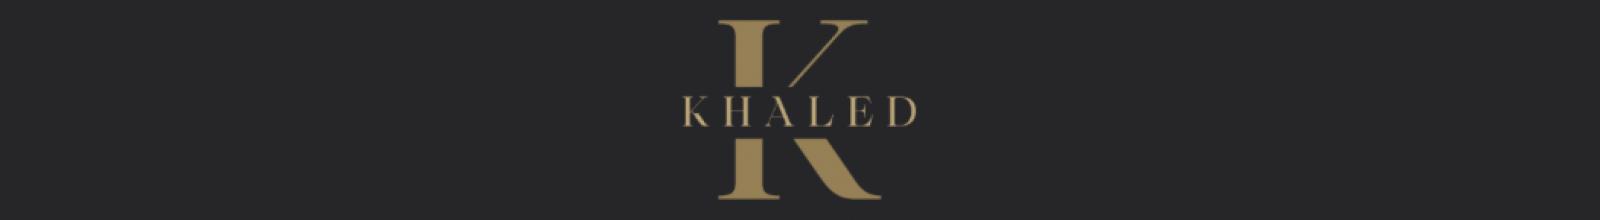 khaled904